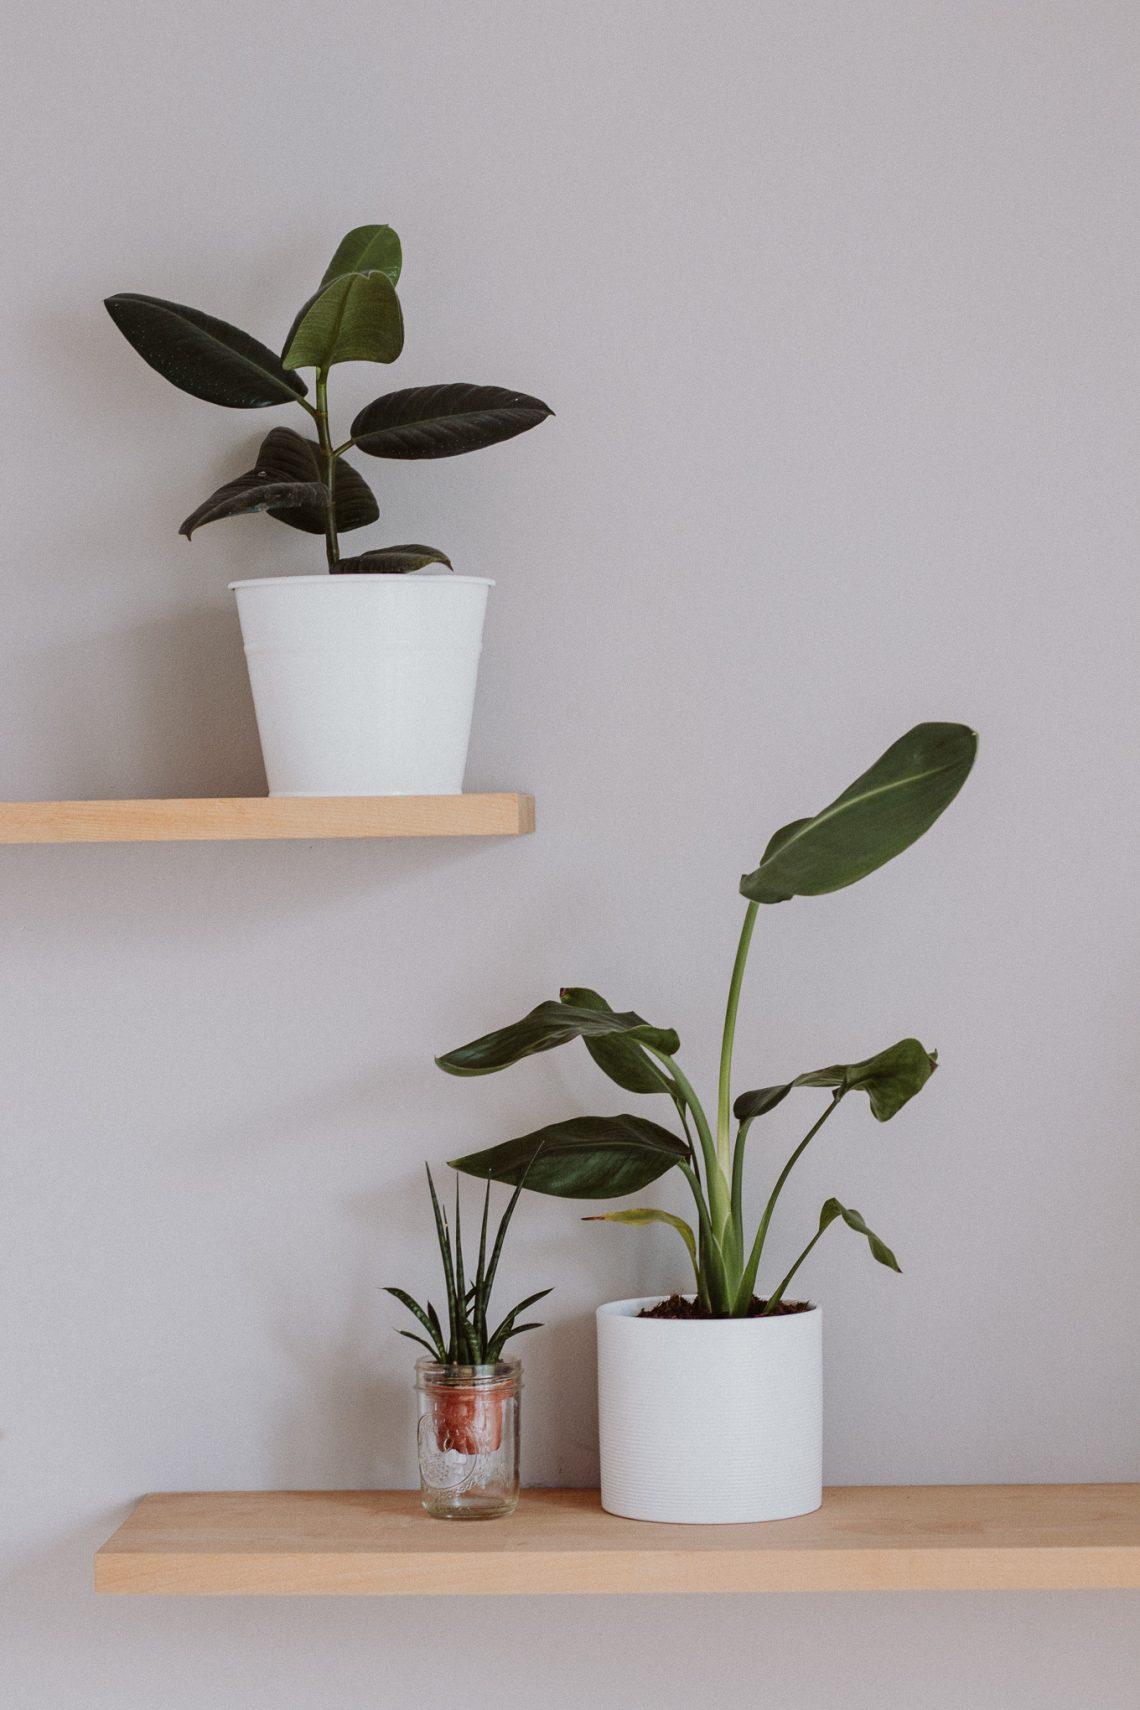 Pflanzenpflege 101